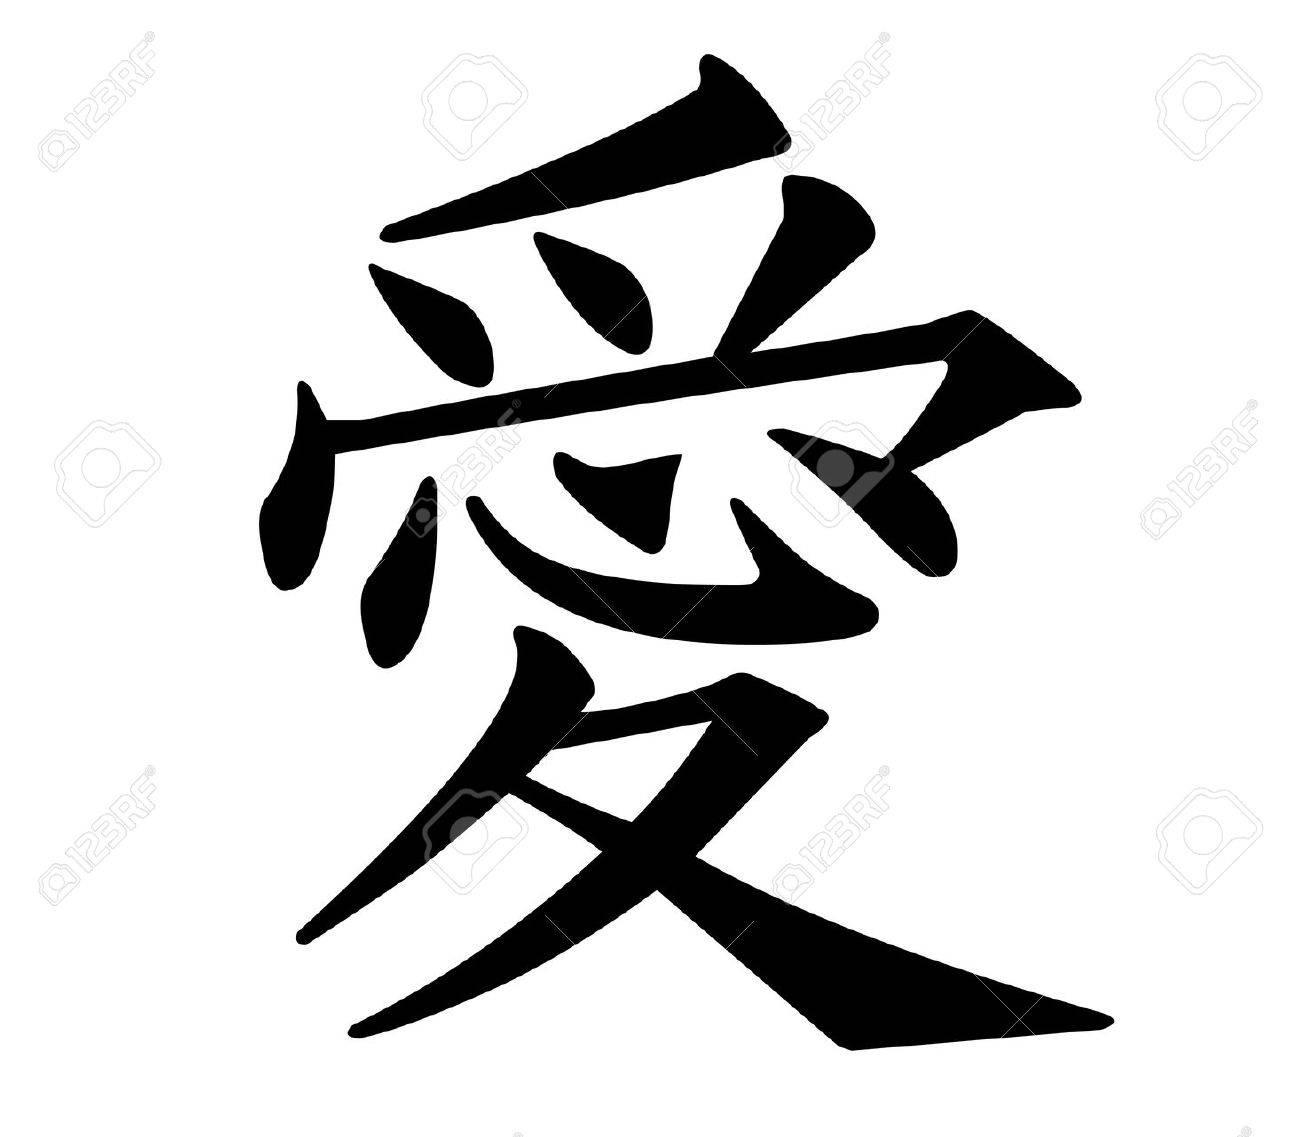 Japanese kanji character for love stock photo picture and royalty japanese kanji character for love stock photo 8634265 buycottarizona Images